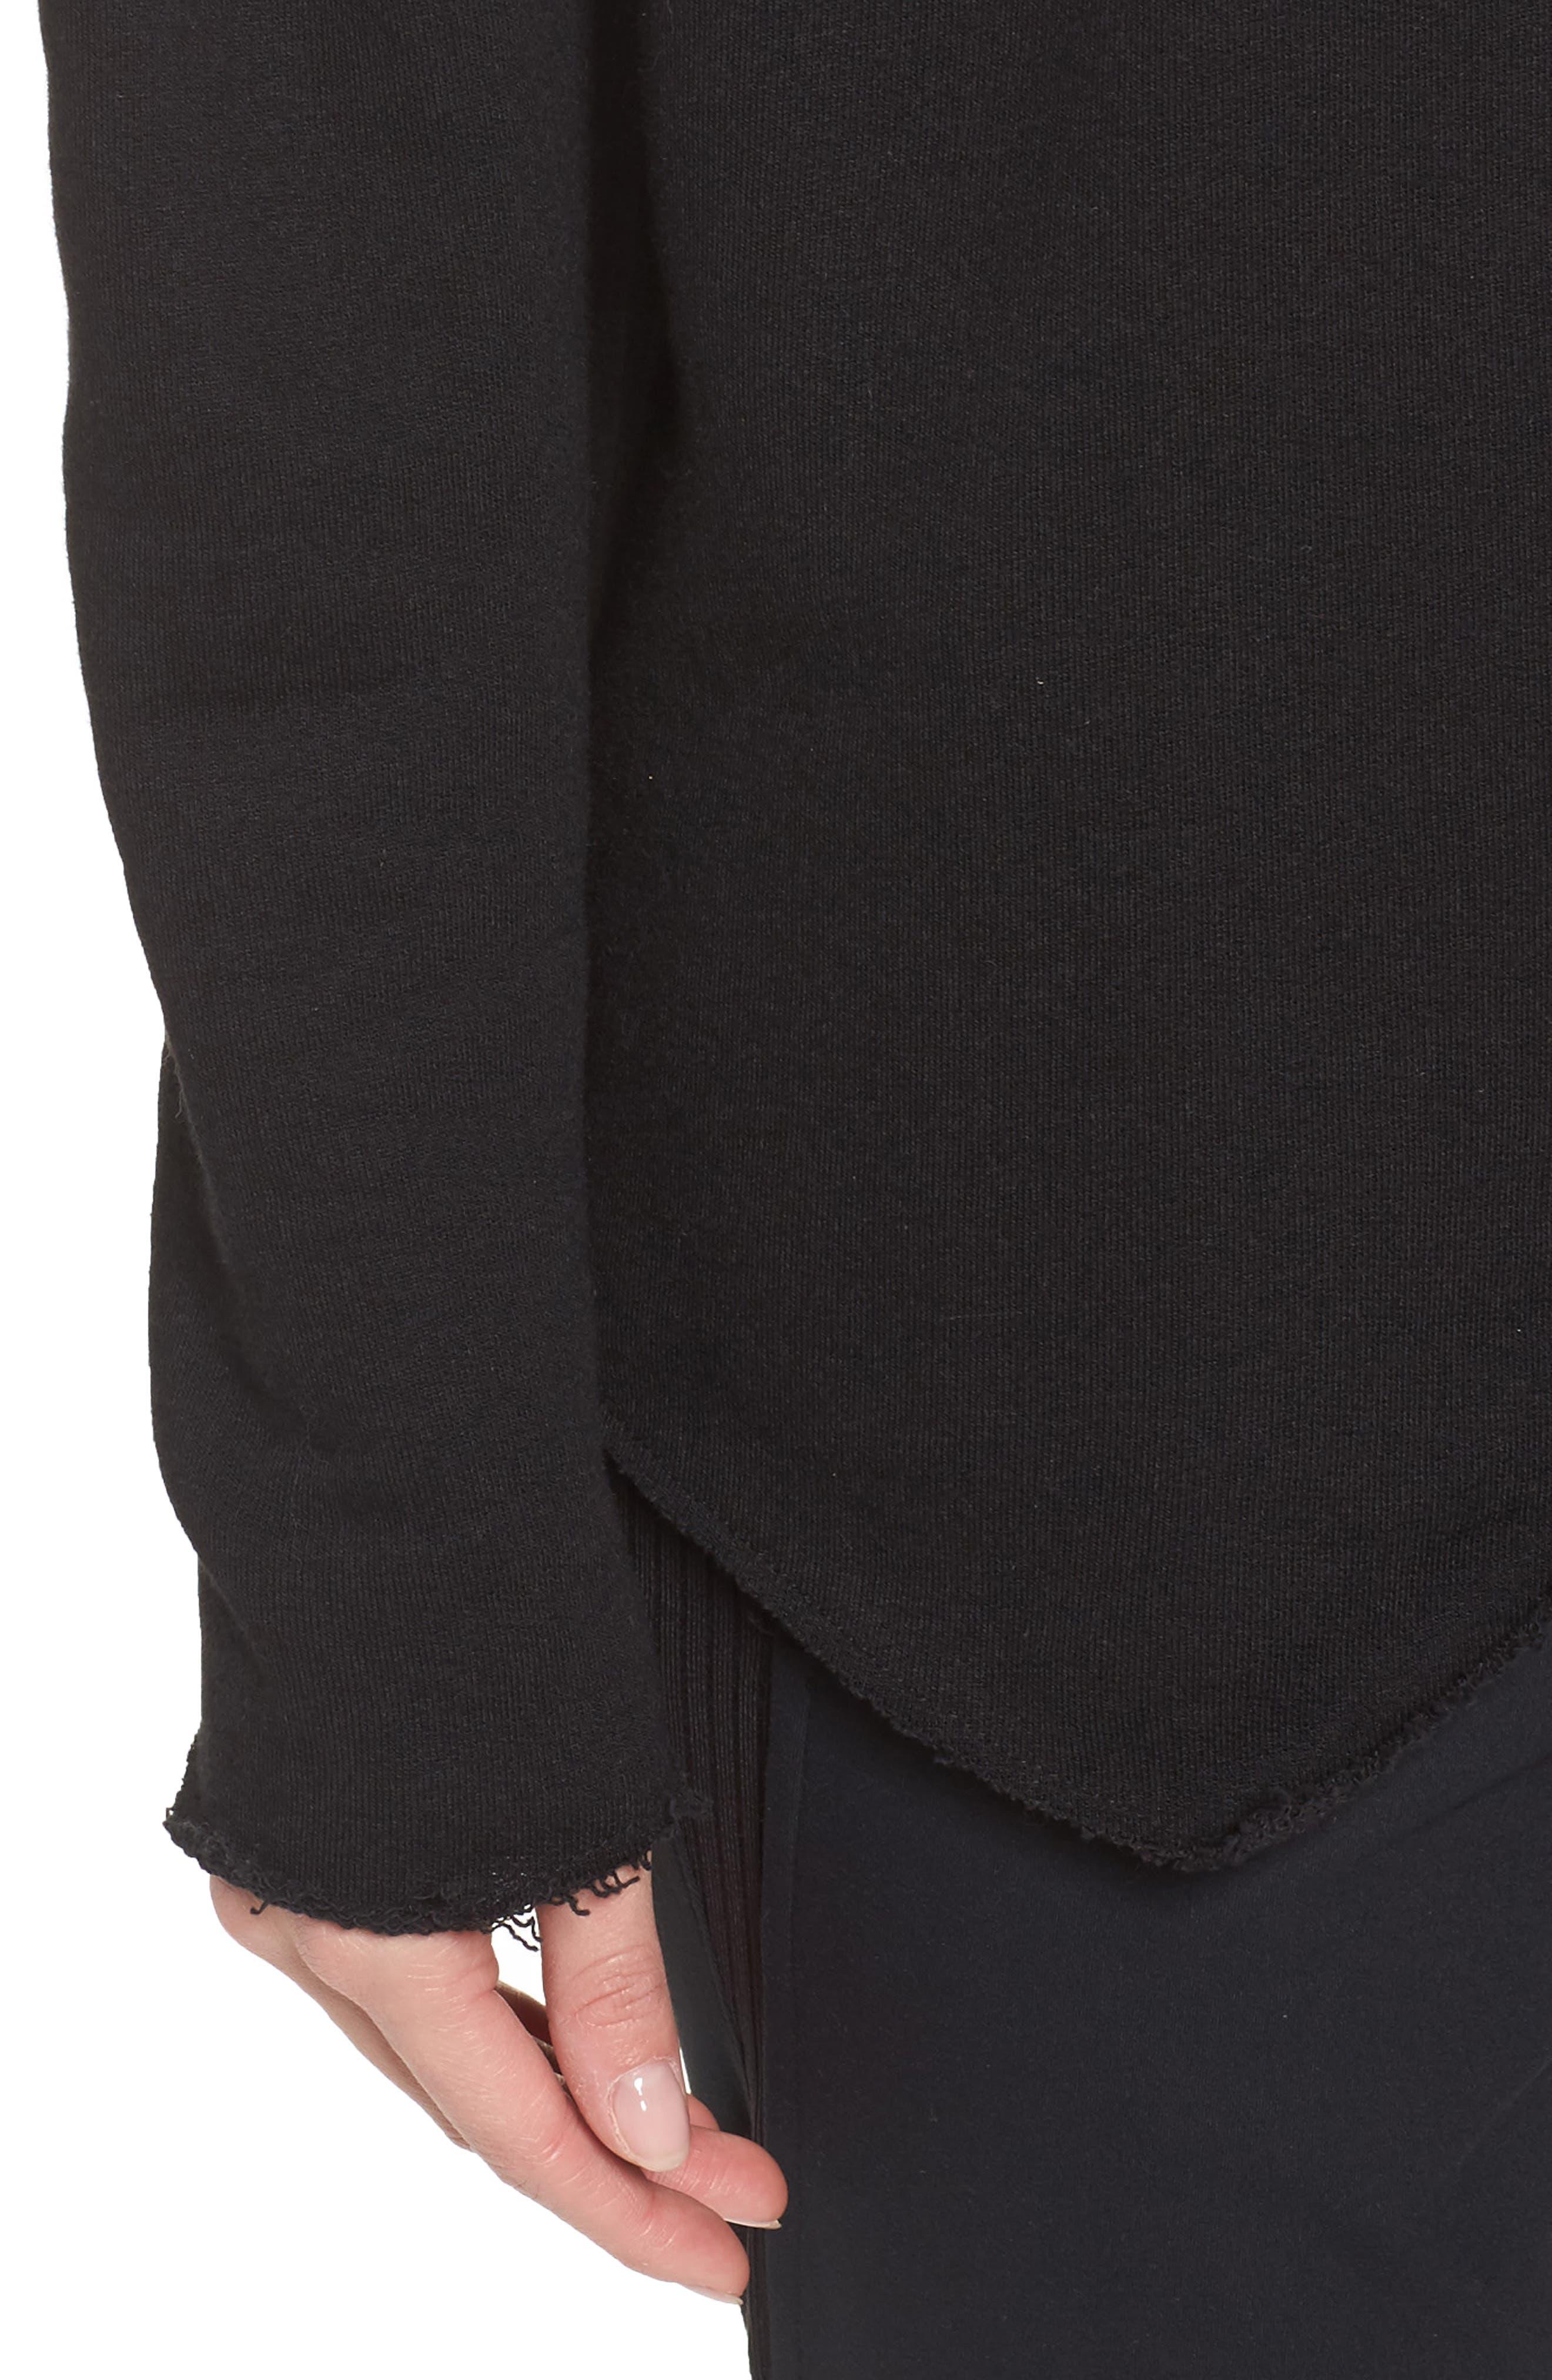 Exhale Sweatshirt,                             Alternate thumbnail 4, color,                             Black